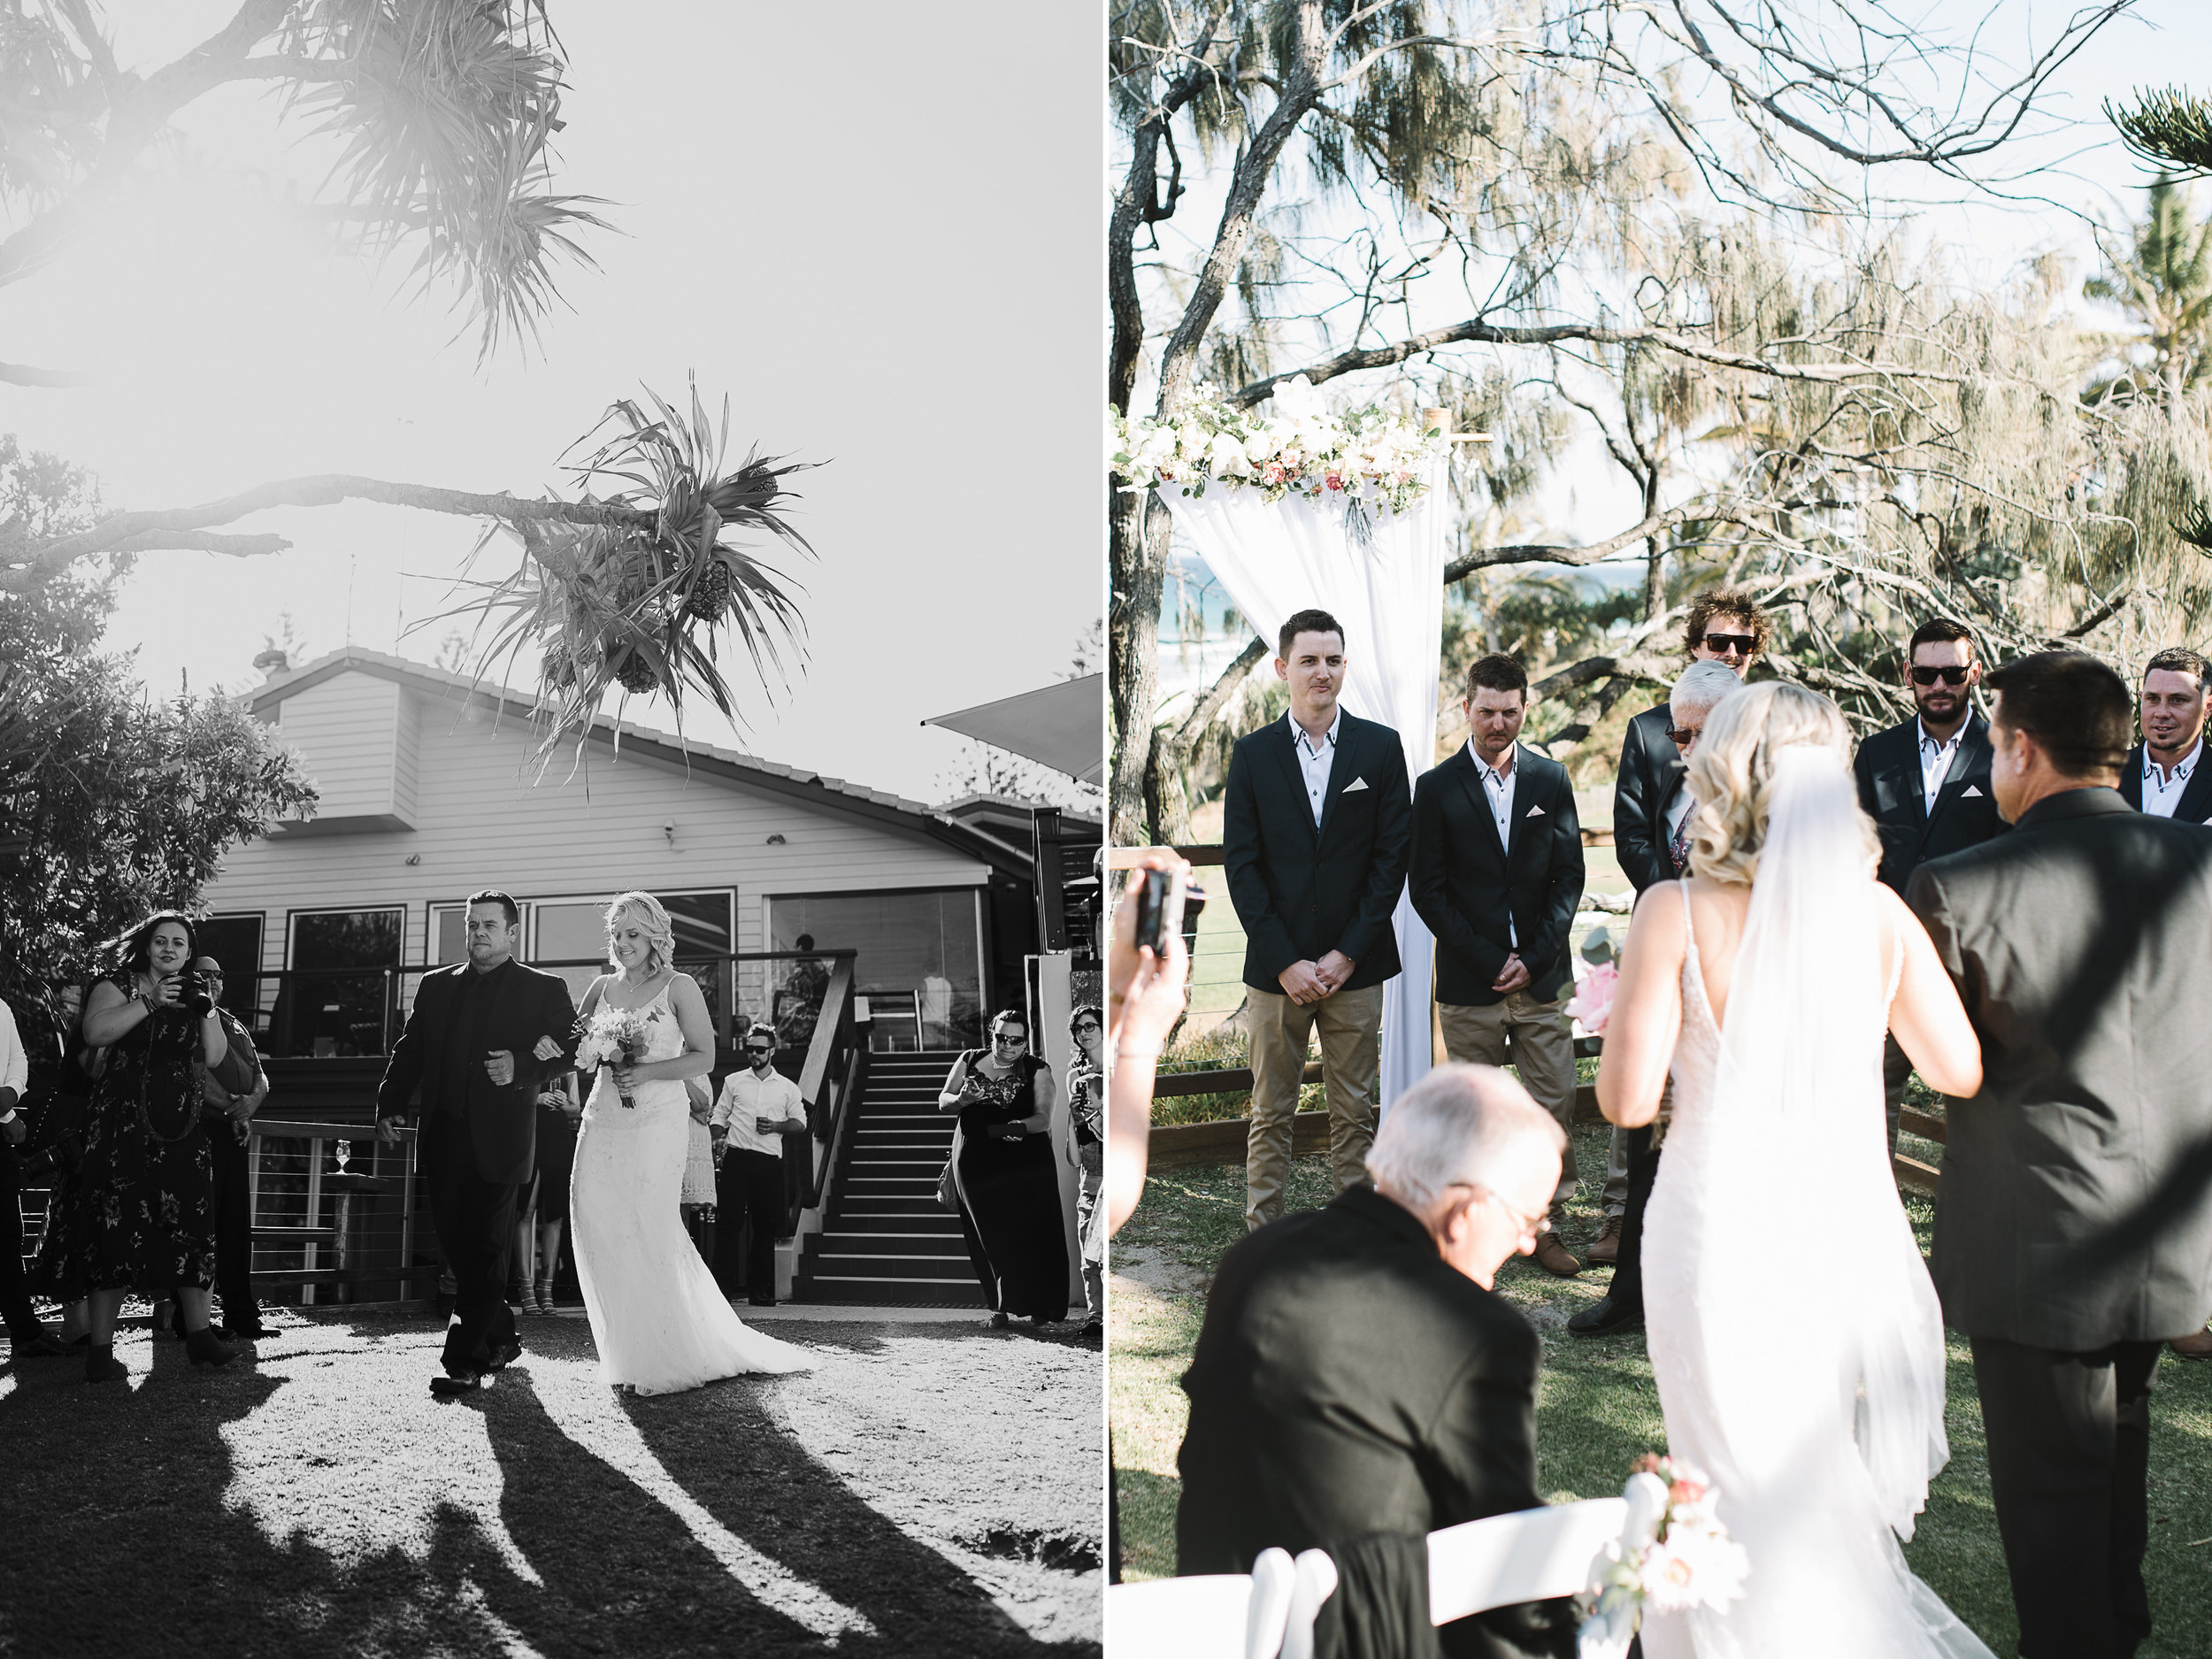 Queensland-Beach-Wedding-10.jpg